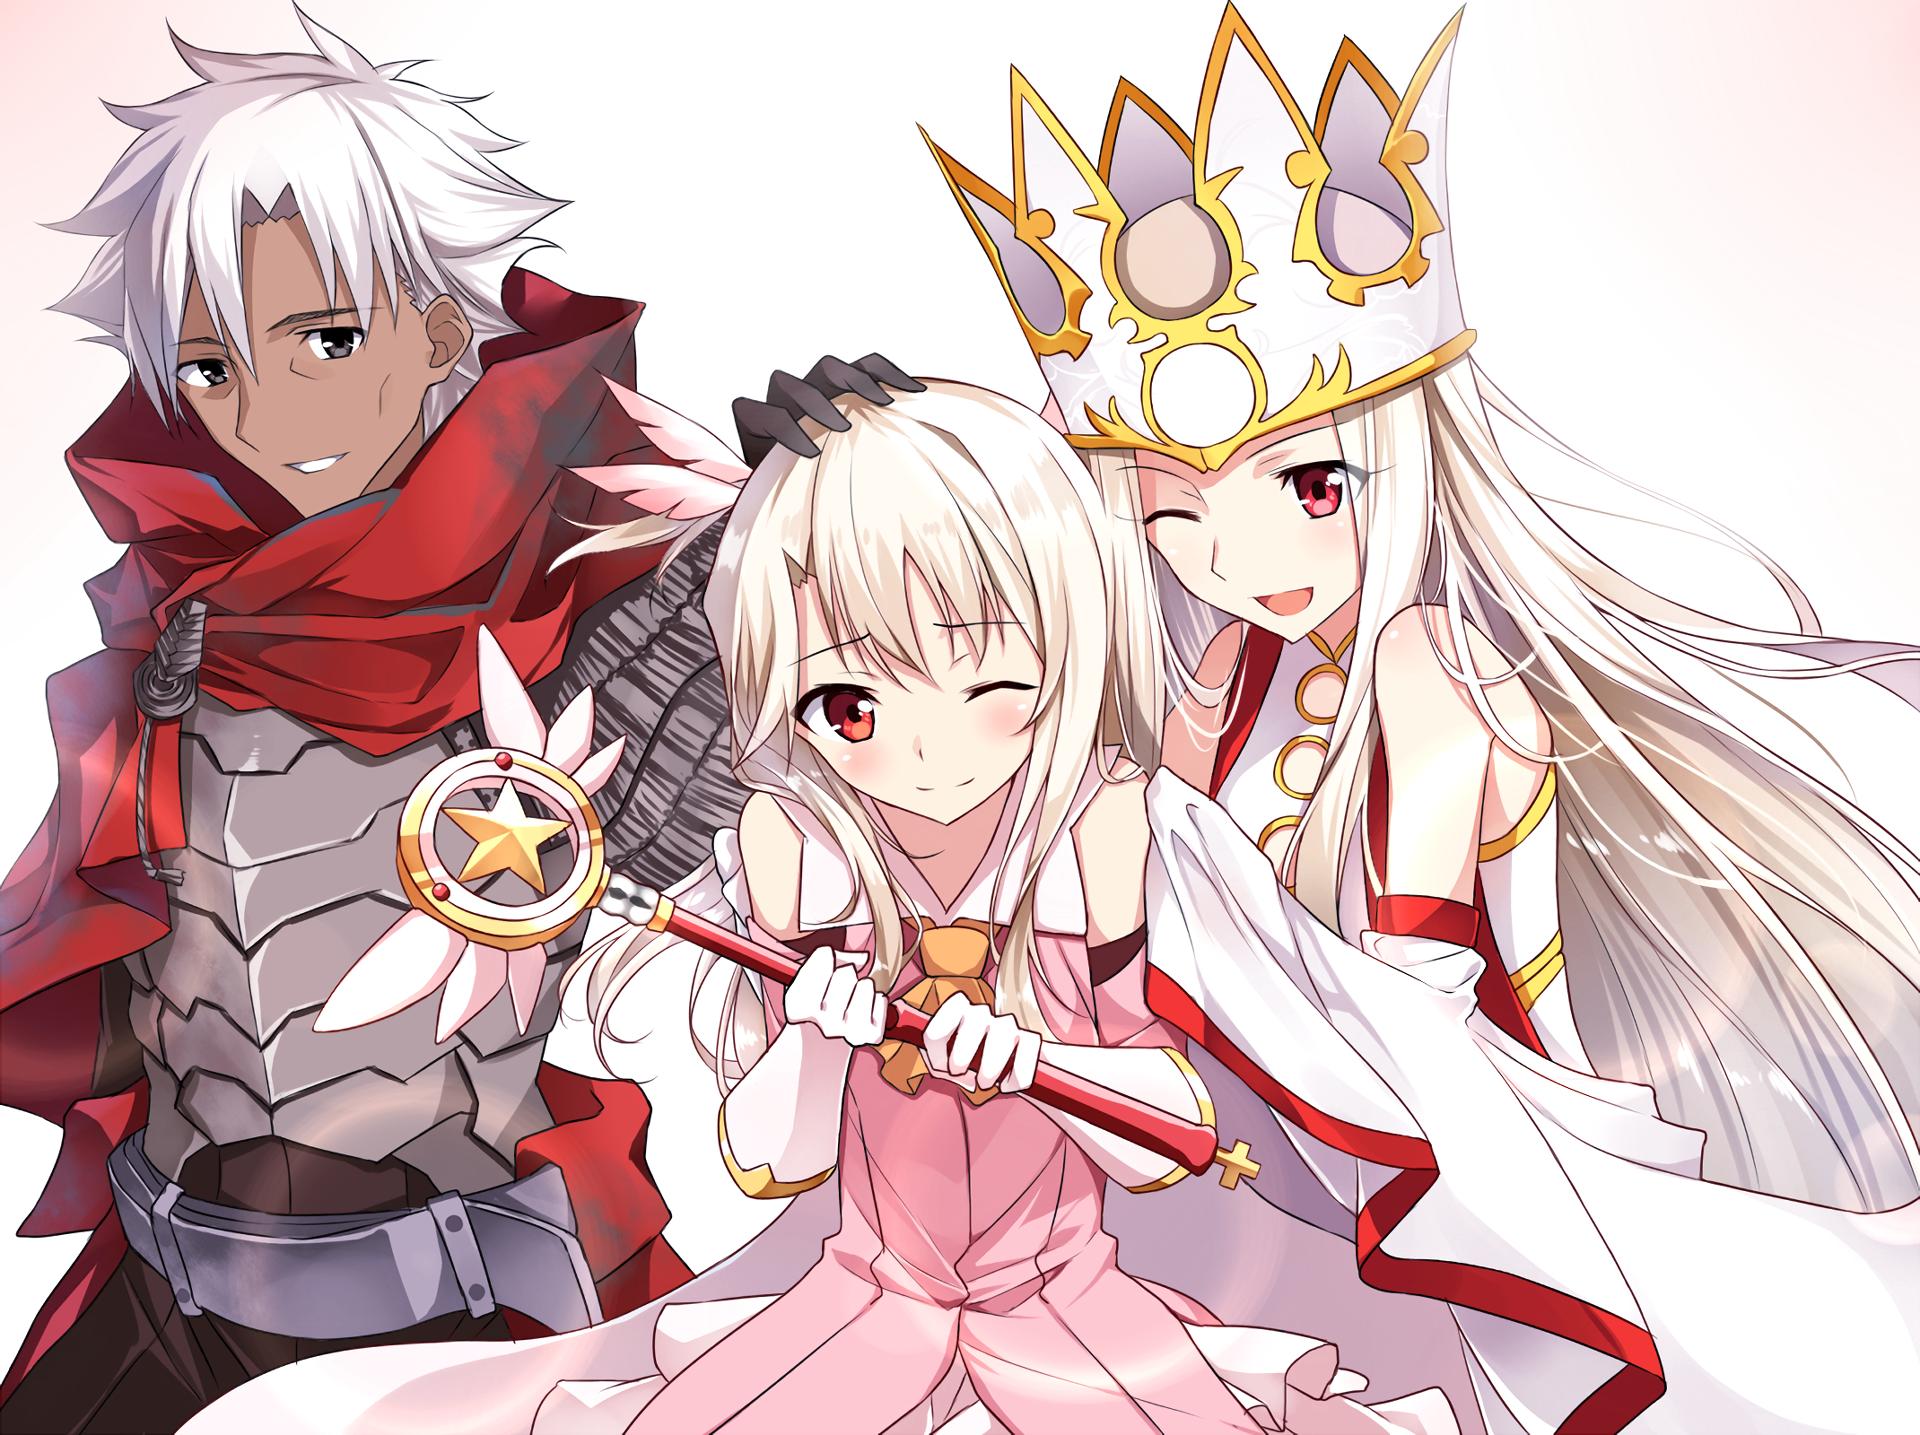 Anime Fate Kaleid Liner Prisma Illya Kiritsugu Emiya Illyasviel